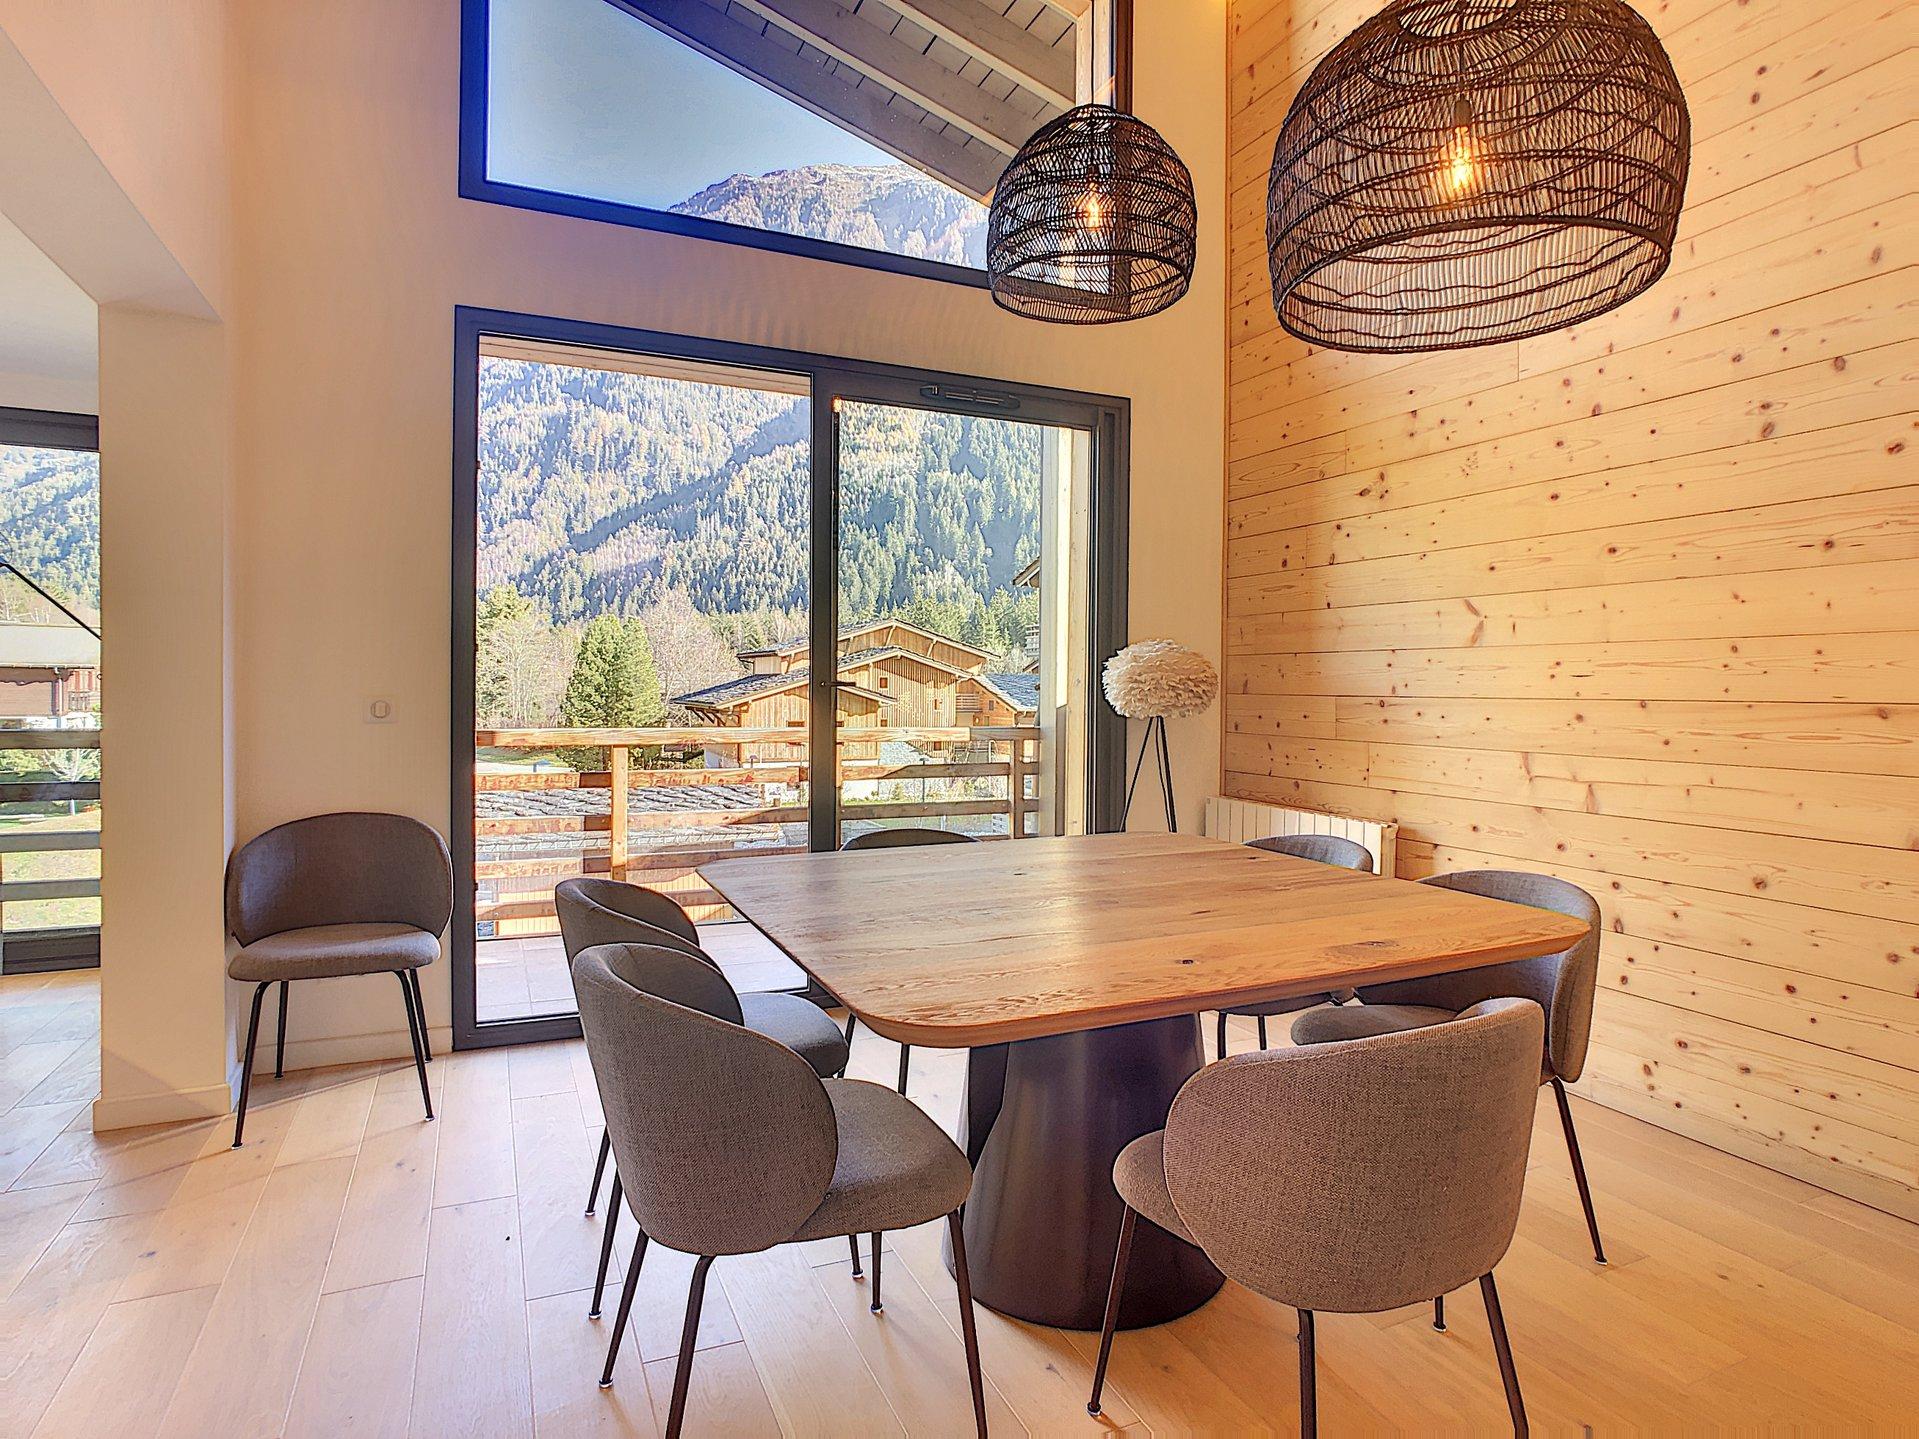 Appartement 3/4 chambres, Chamonix Mont-Blanc